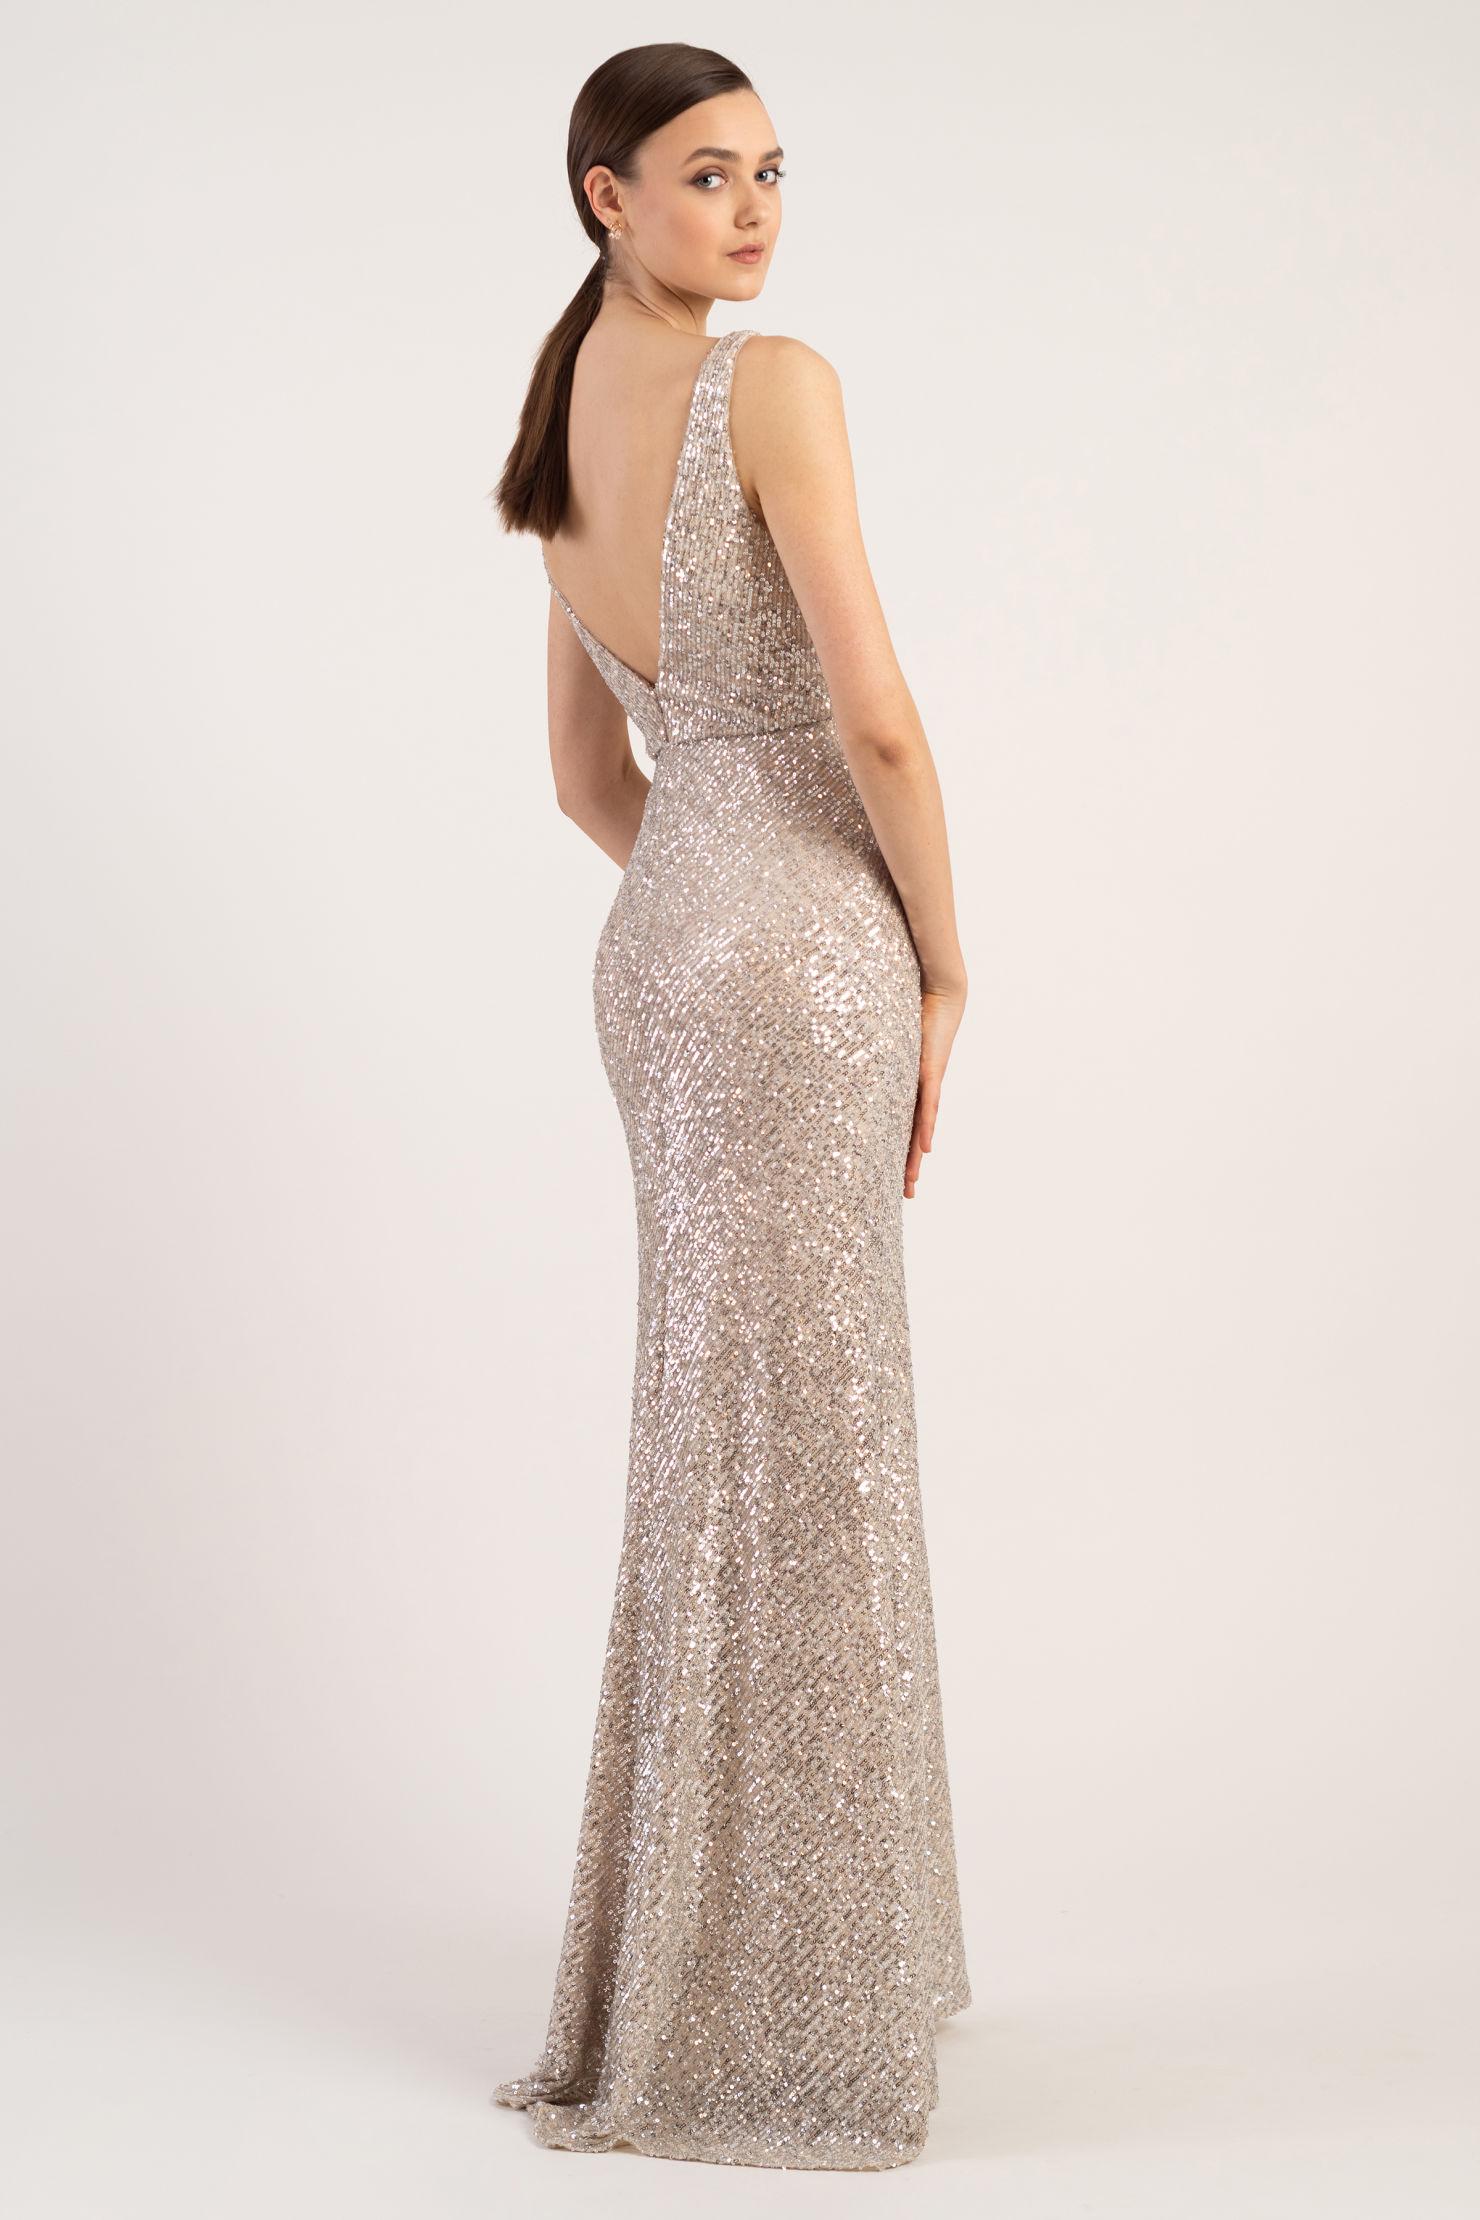 Billie Bridesmaids Dress by Jenny Yoo - Silver